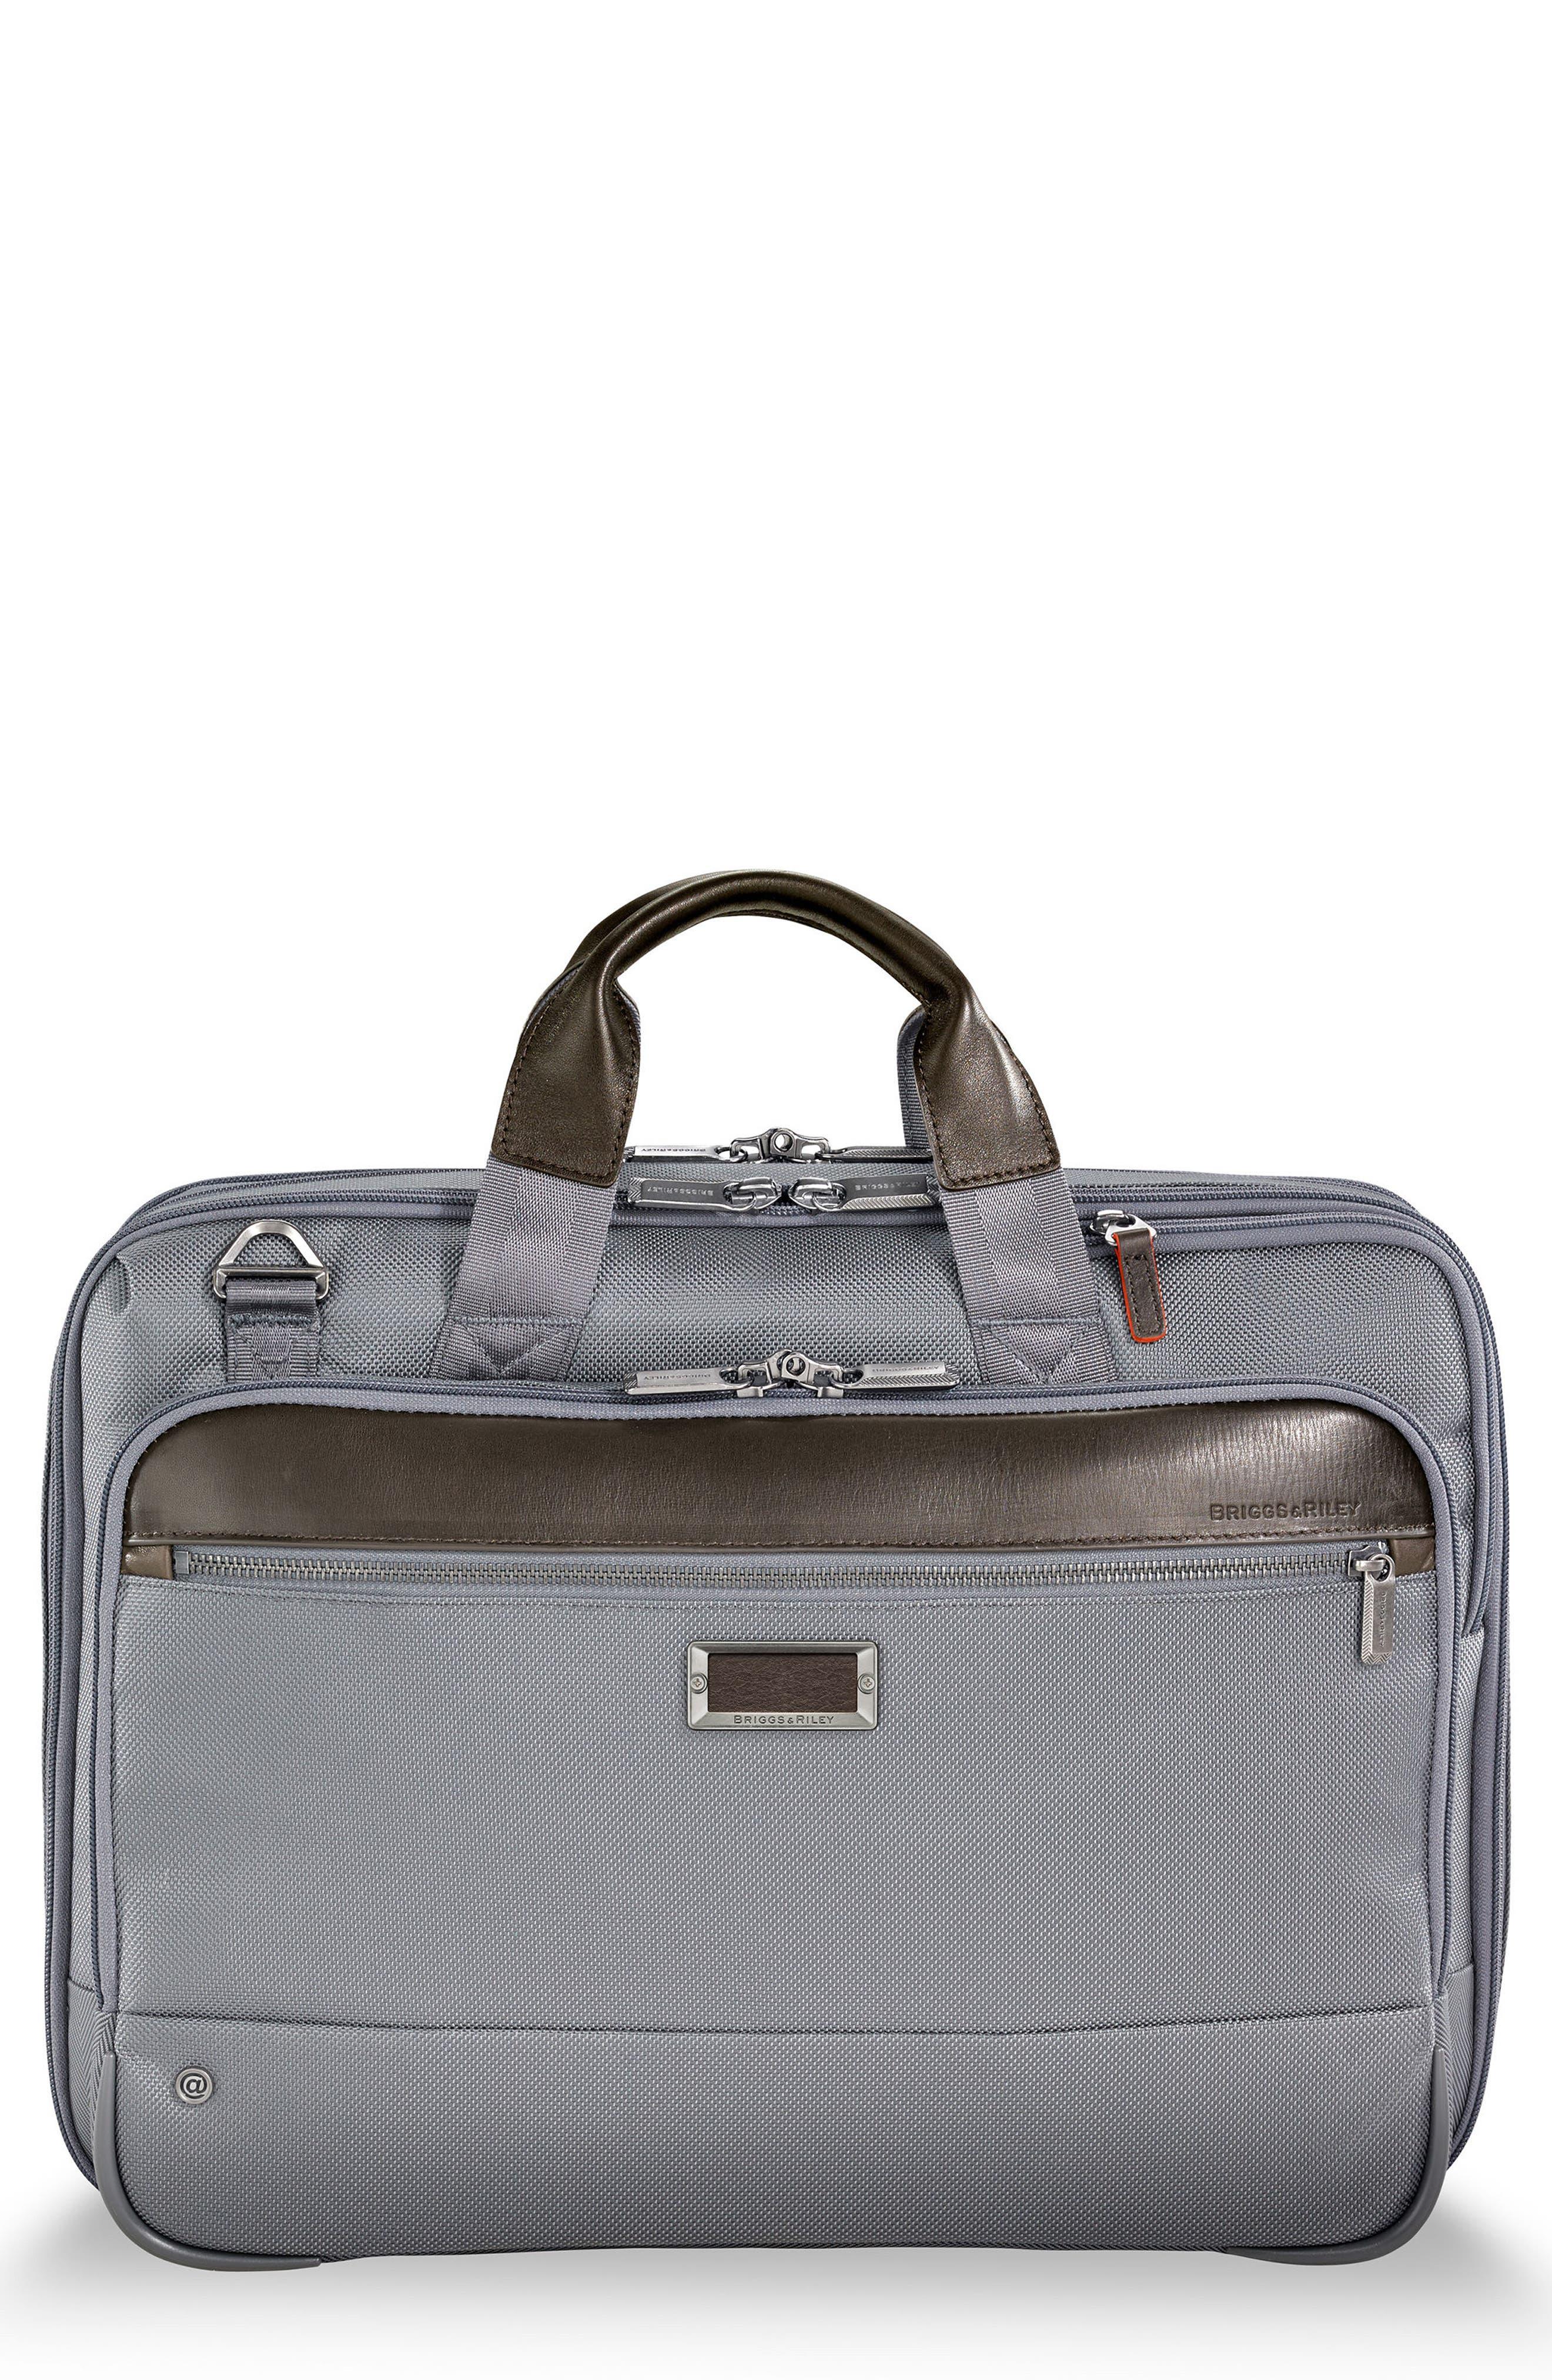 @work Expandable Briefcase,                             Main thumbnail 1, color,                             Grey